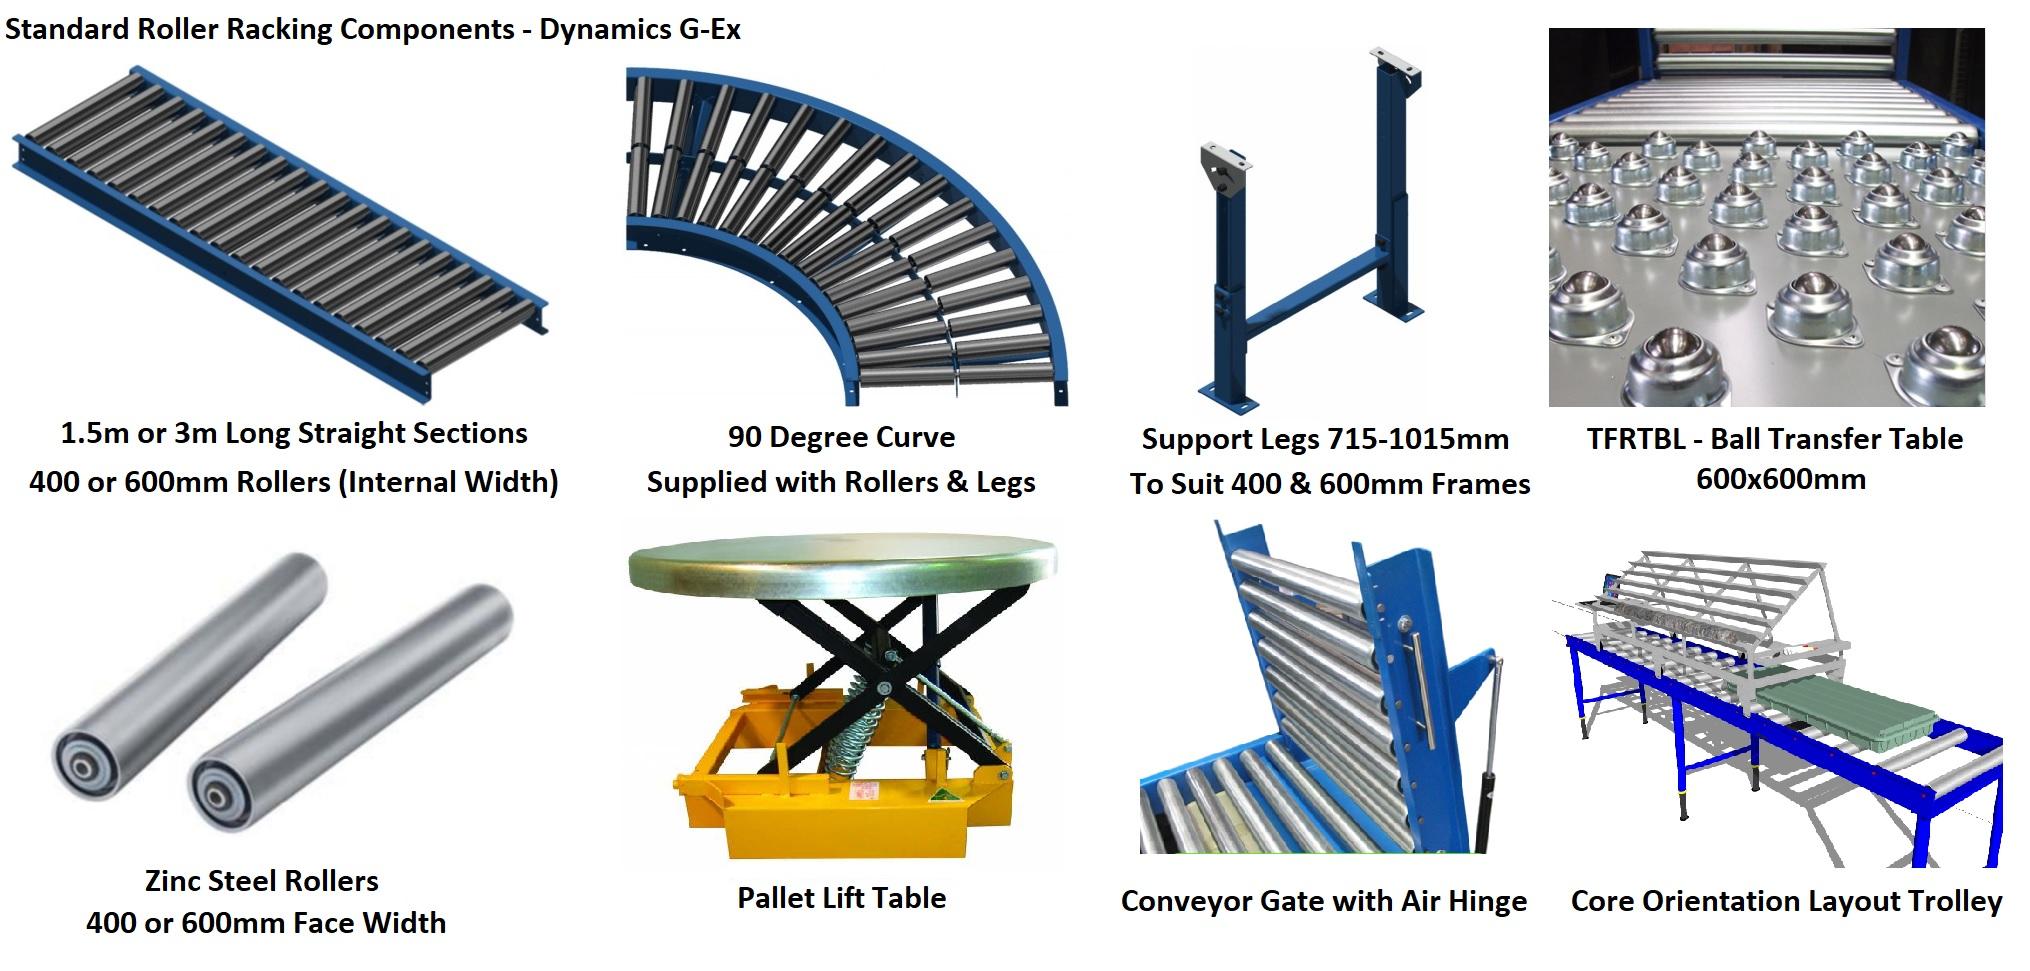 Standard Roller Racking Components